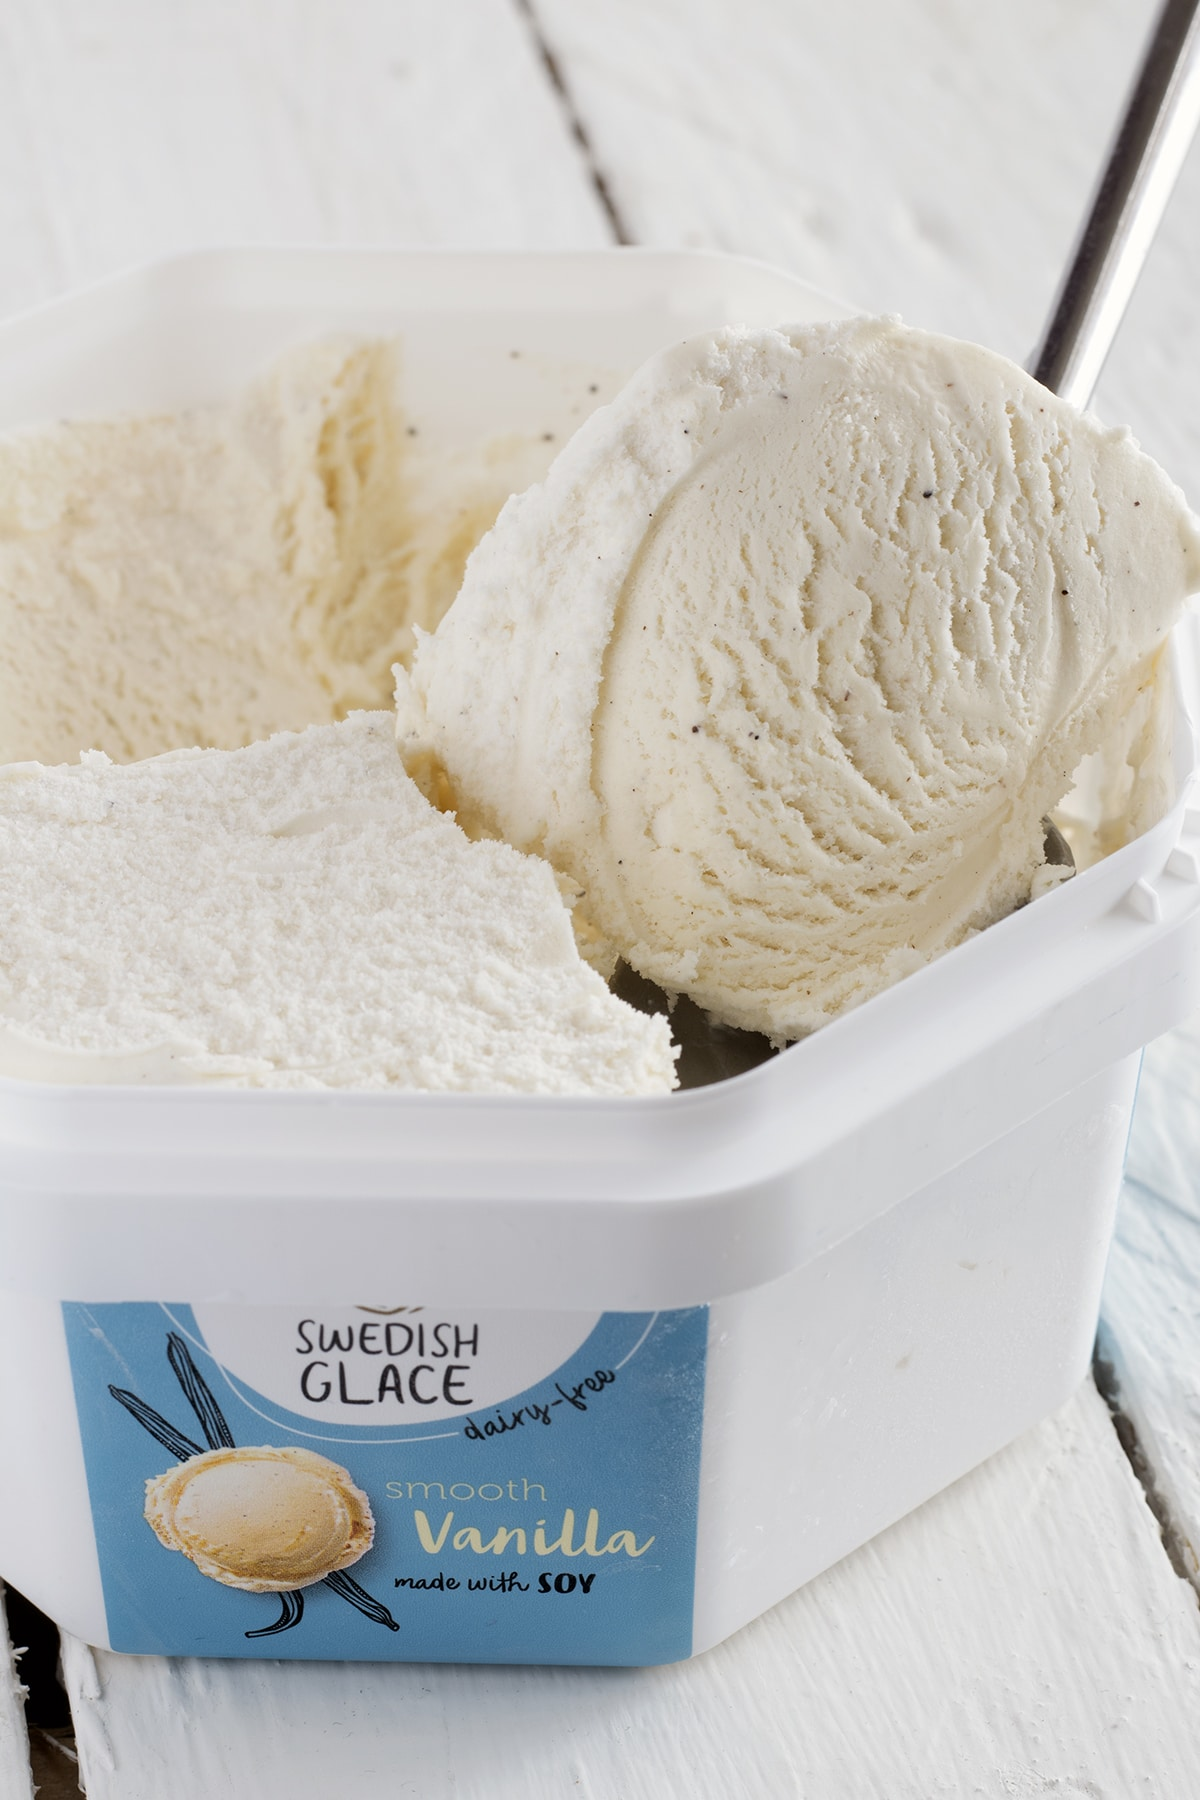 best vegan ice cream swedish glace vanilla